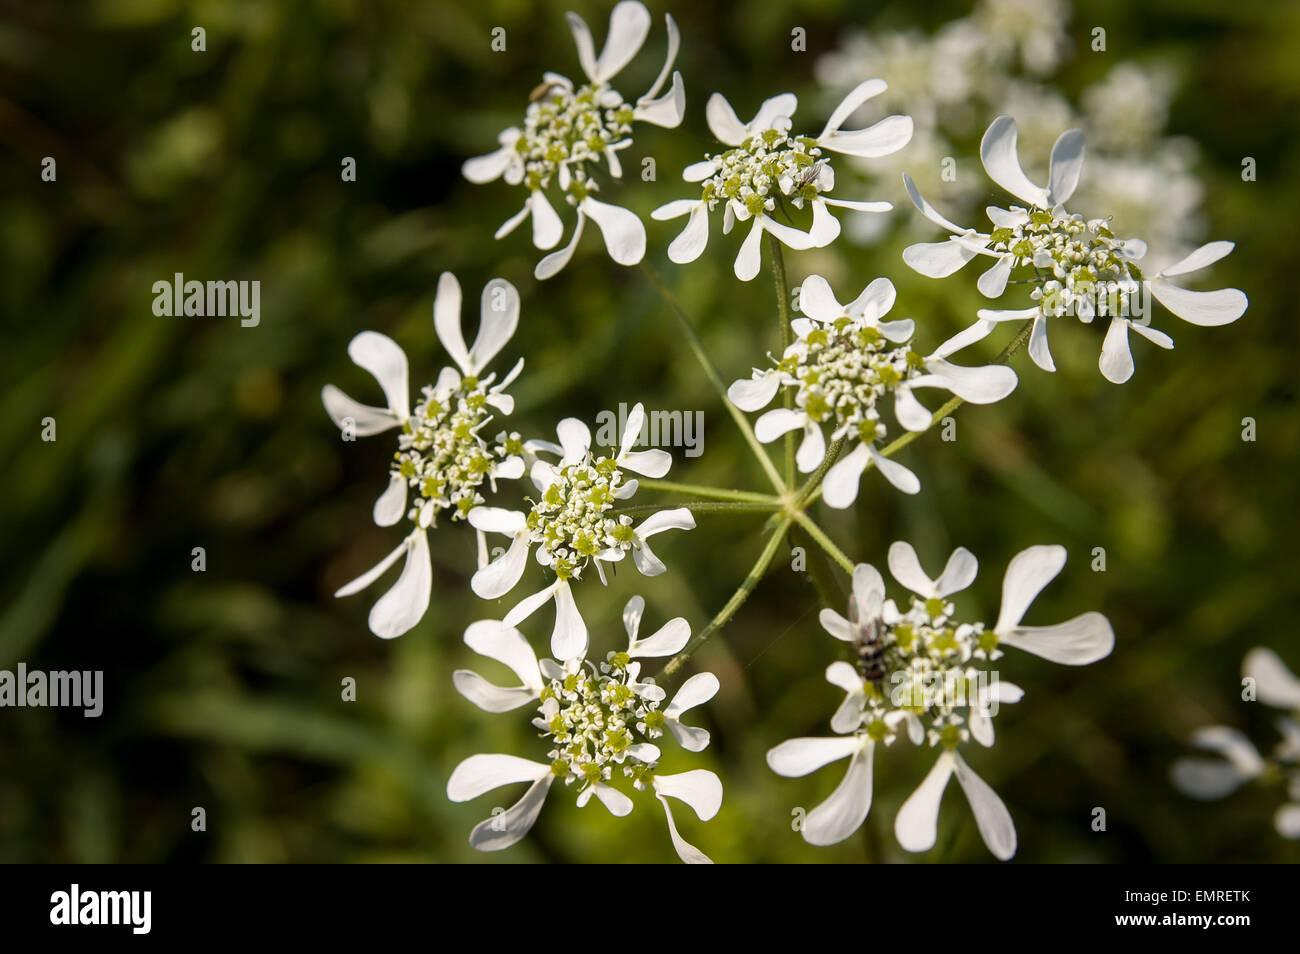 Closeup of an Orlaya Grandiflora from the Apiaceae family Stock Photo